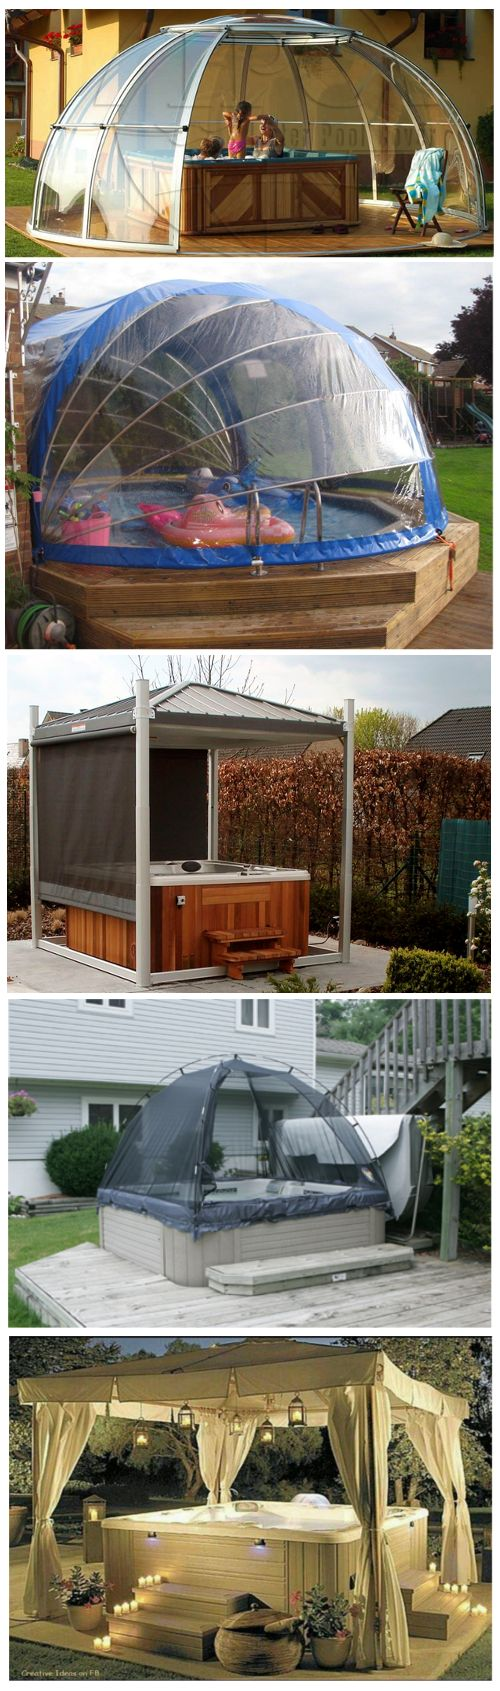 Patio ideas with hot tub - Non Wood Hot Tub Enclosures